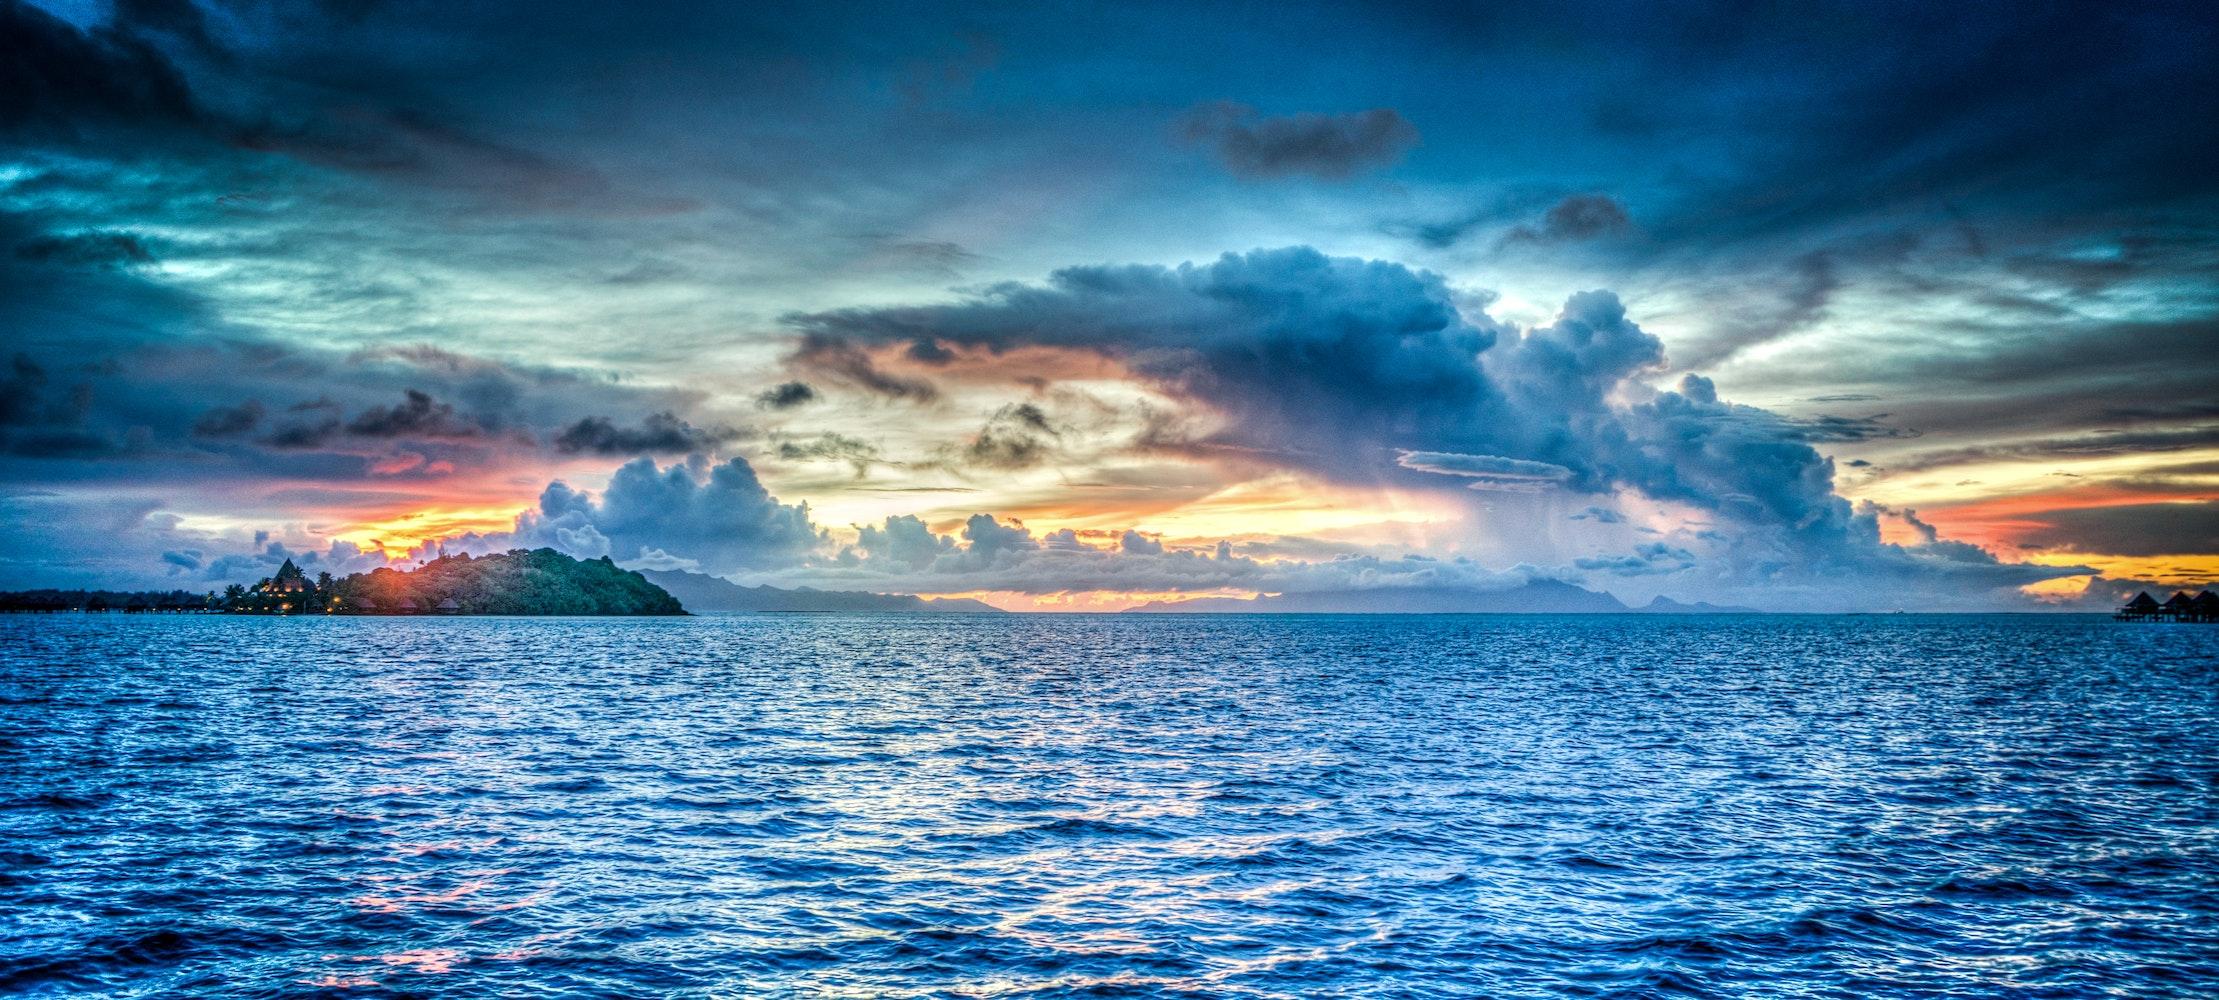 free stock photos of ocean pexels